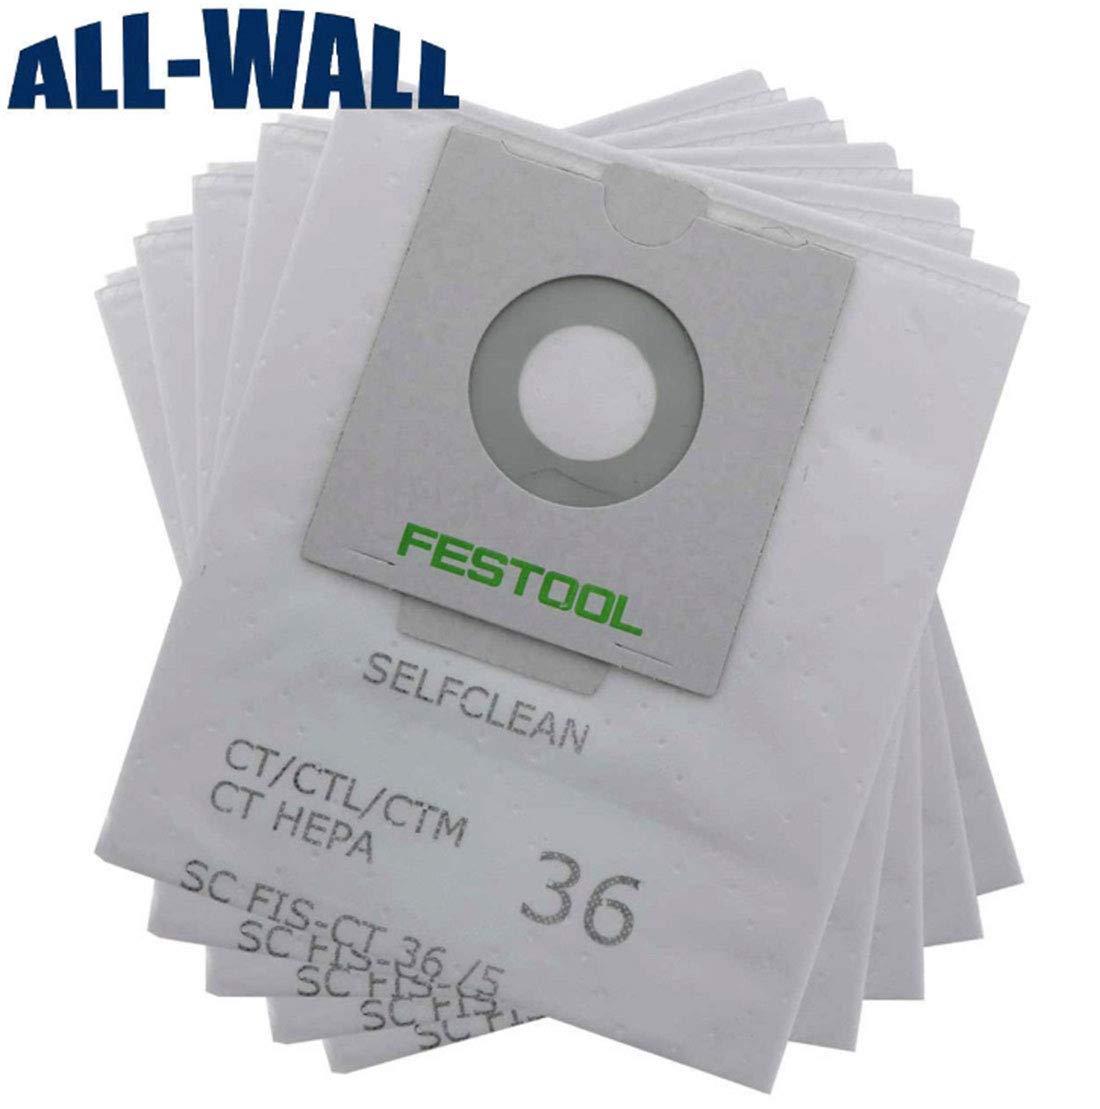 Simuke sc fis-ct 36 496186-5 sacchetti per Festool aspirapolvere